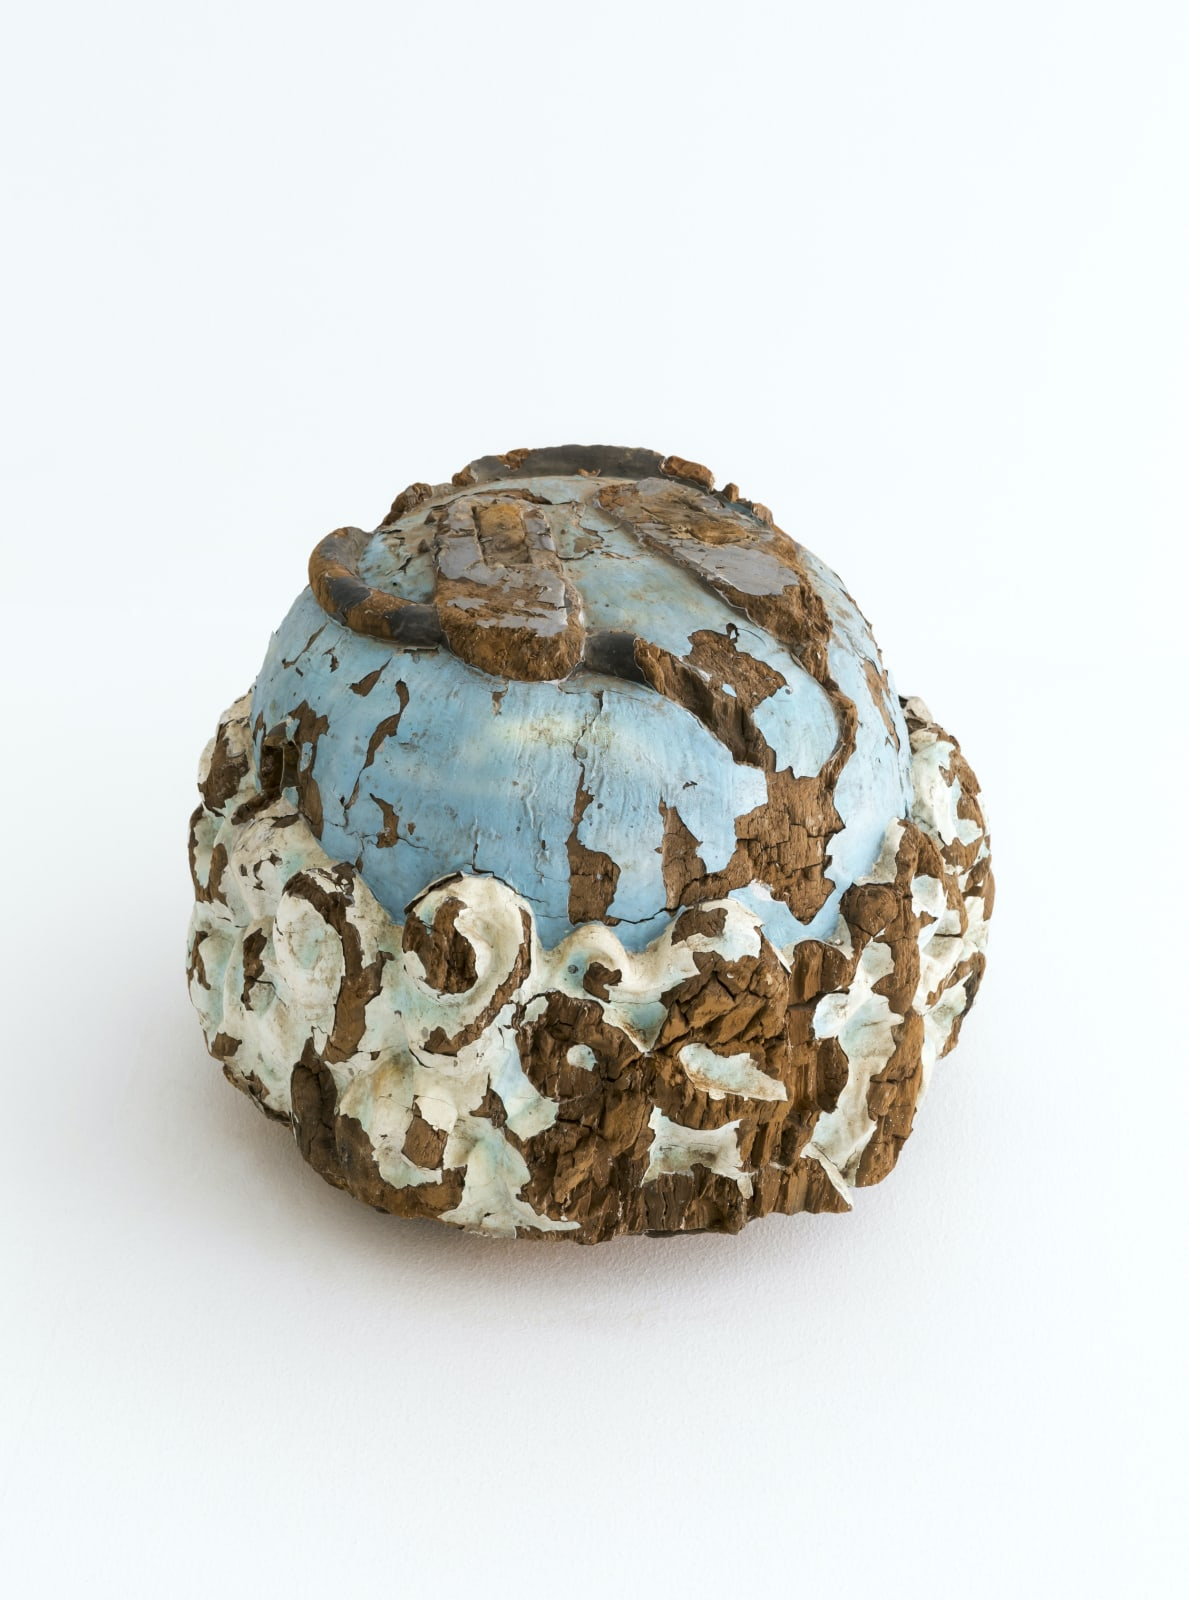 Globe, 2018, Gmelina wood, paint, 33.4 x 43 x 42.3 cm